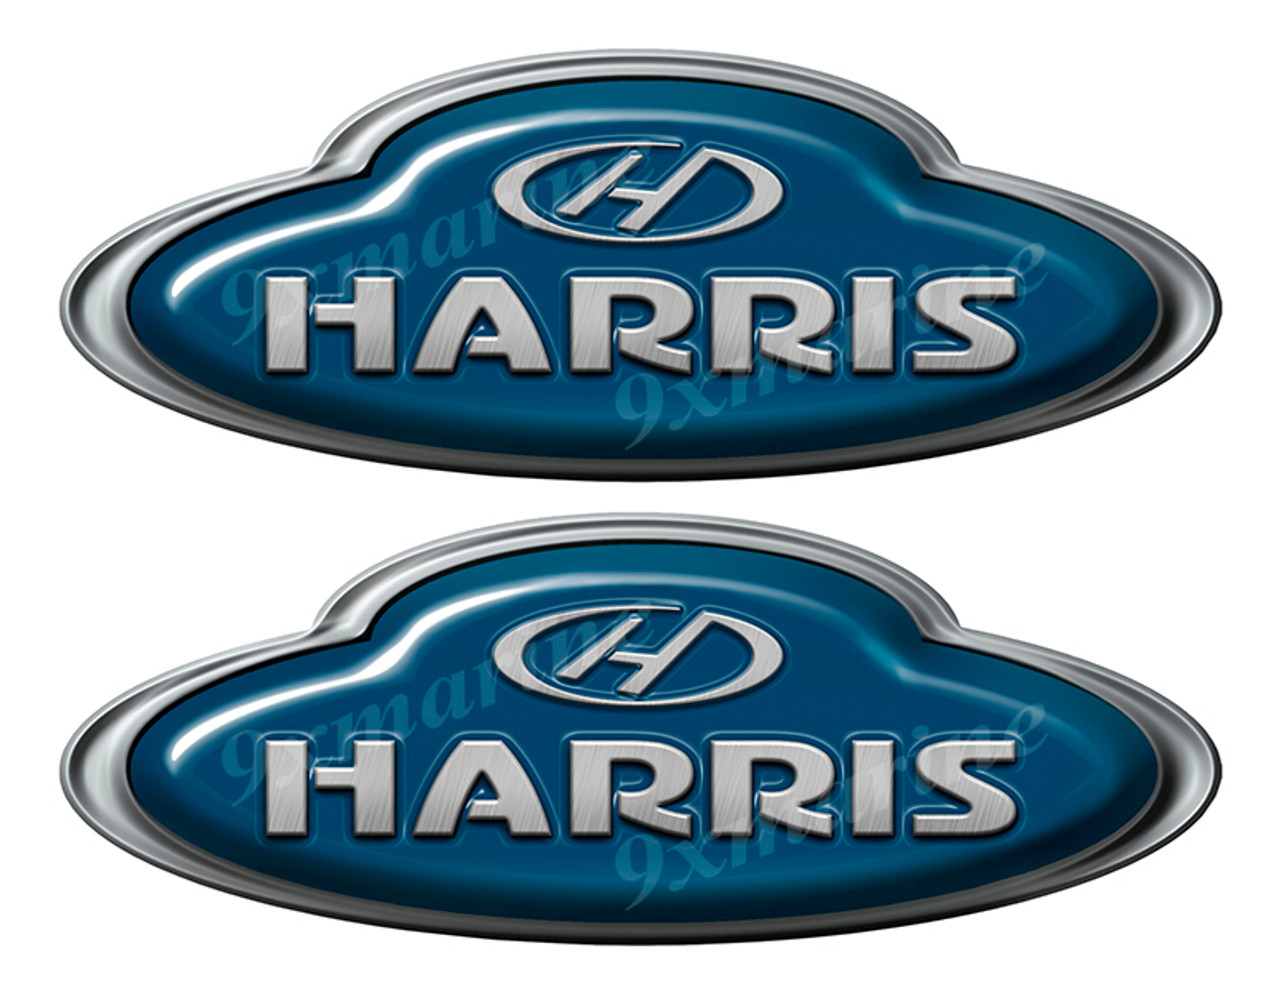 Harris Boat Oval Sticker set - Name Plate